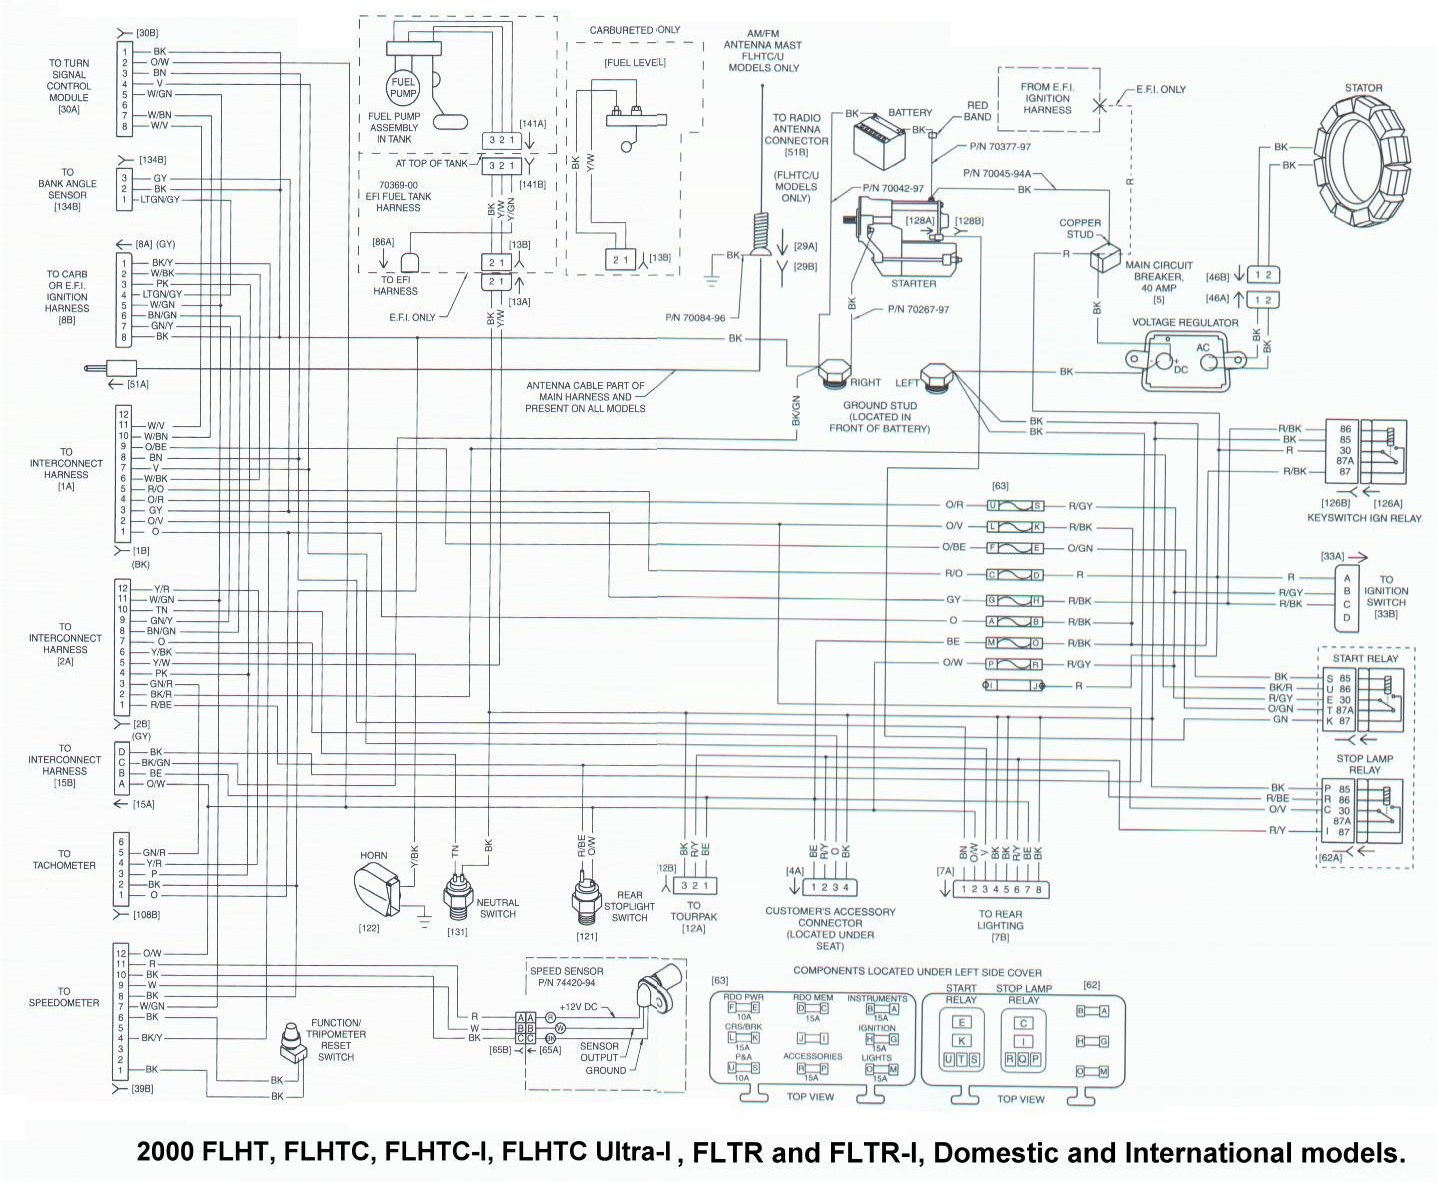 Fine Harley Wiring Diagram For 2006 Electra Glide Location 107 Wiring Wiring Cloud Ittabpendurdonanfuldomelitekicepsianuembamohammedshrineorg